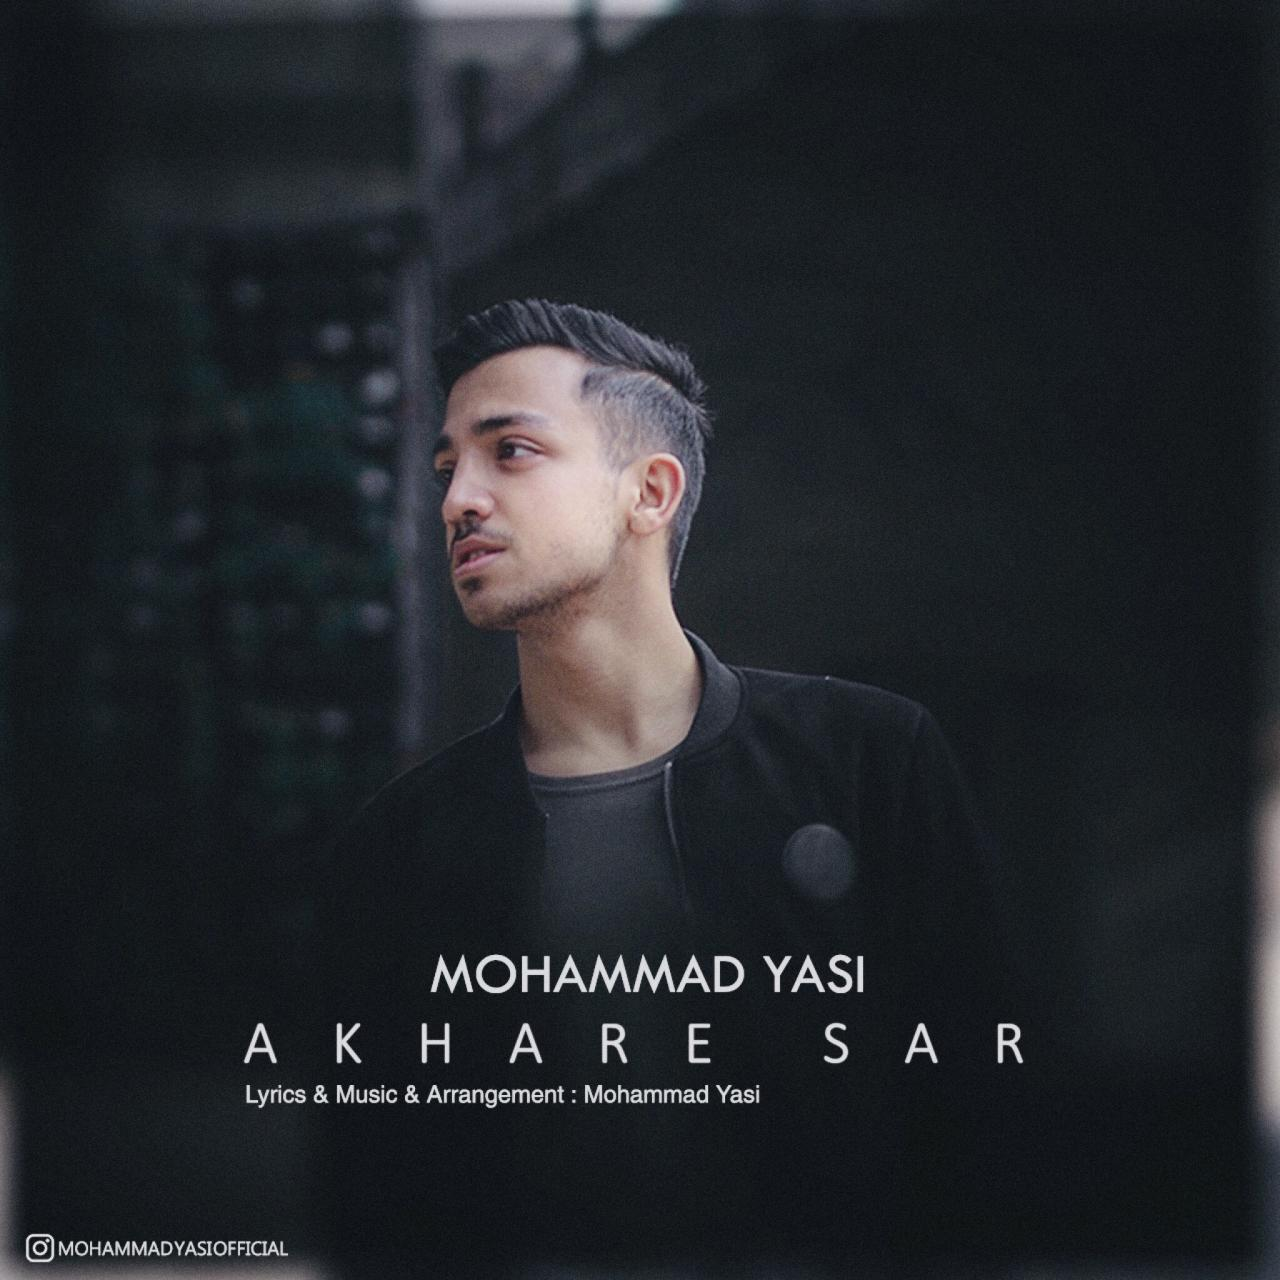 mohammad yasi akhare sar دانلود اهنگ آخر سر محمد یاسی